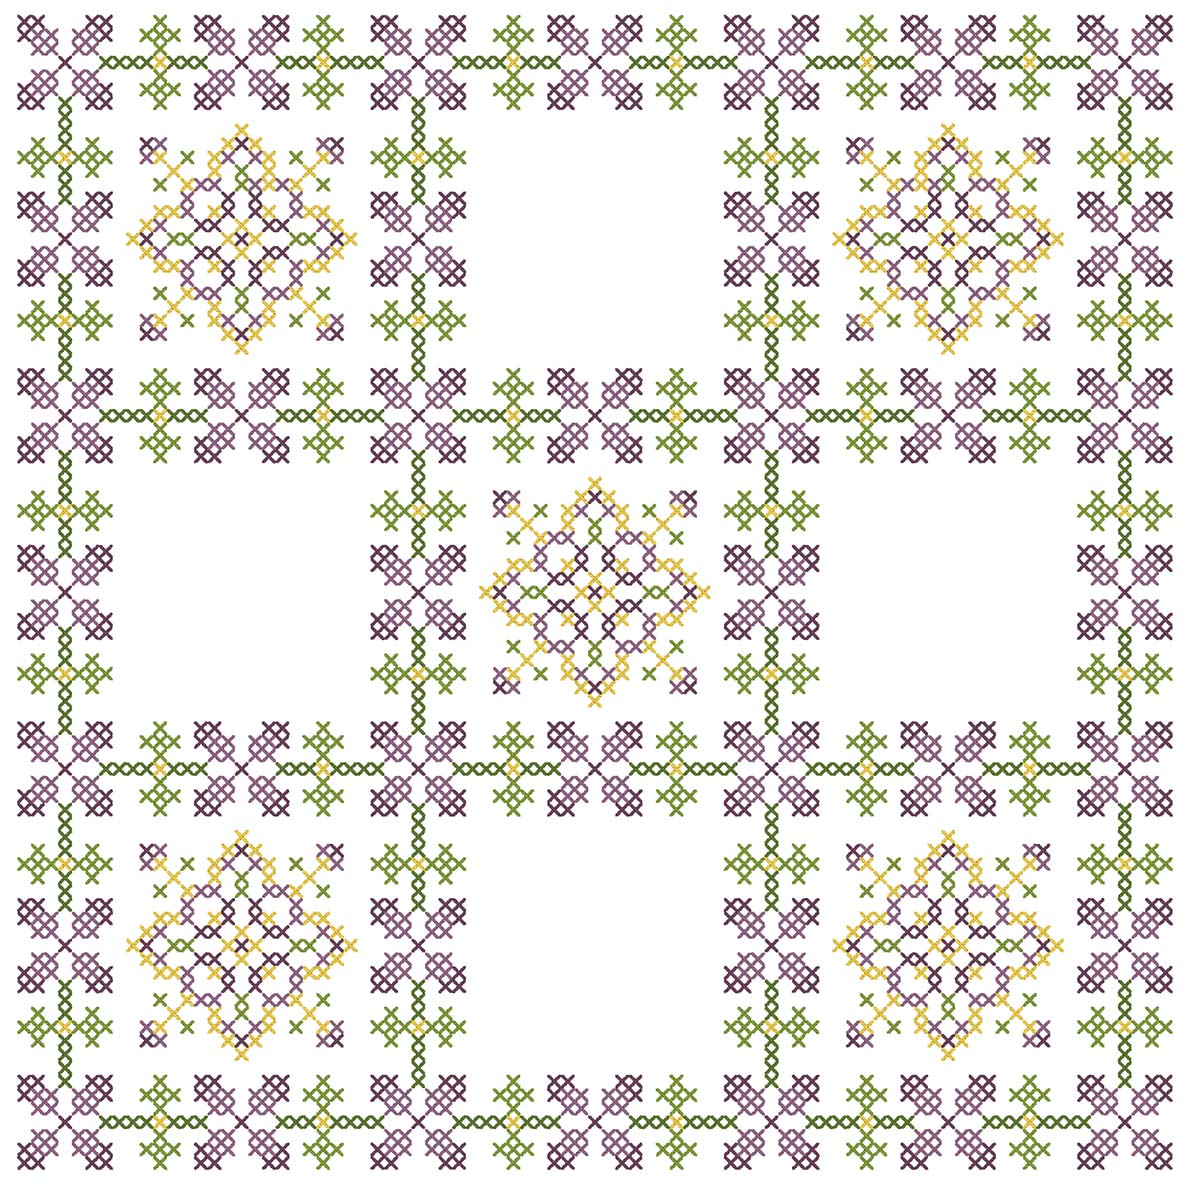 Herrschners® Floral Kaleidoscope Quilt Blocks Stamped Cross-Stitch